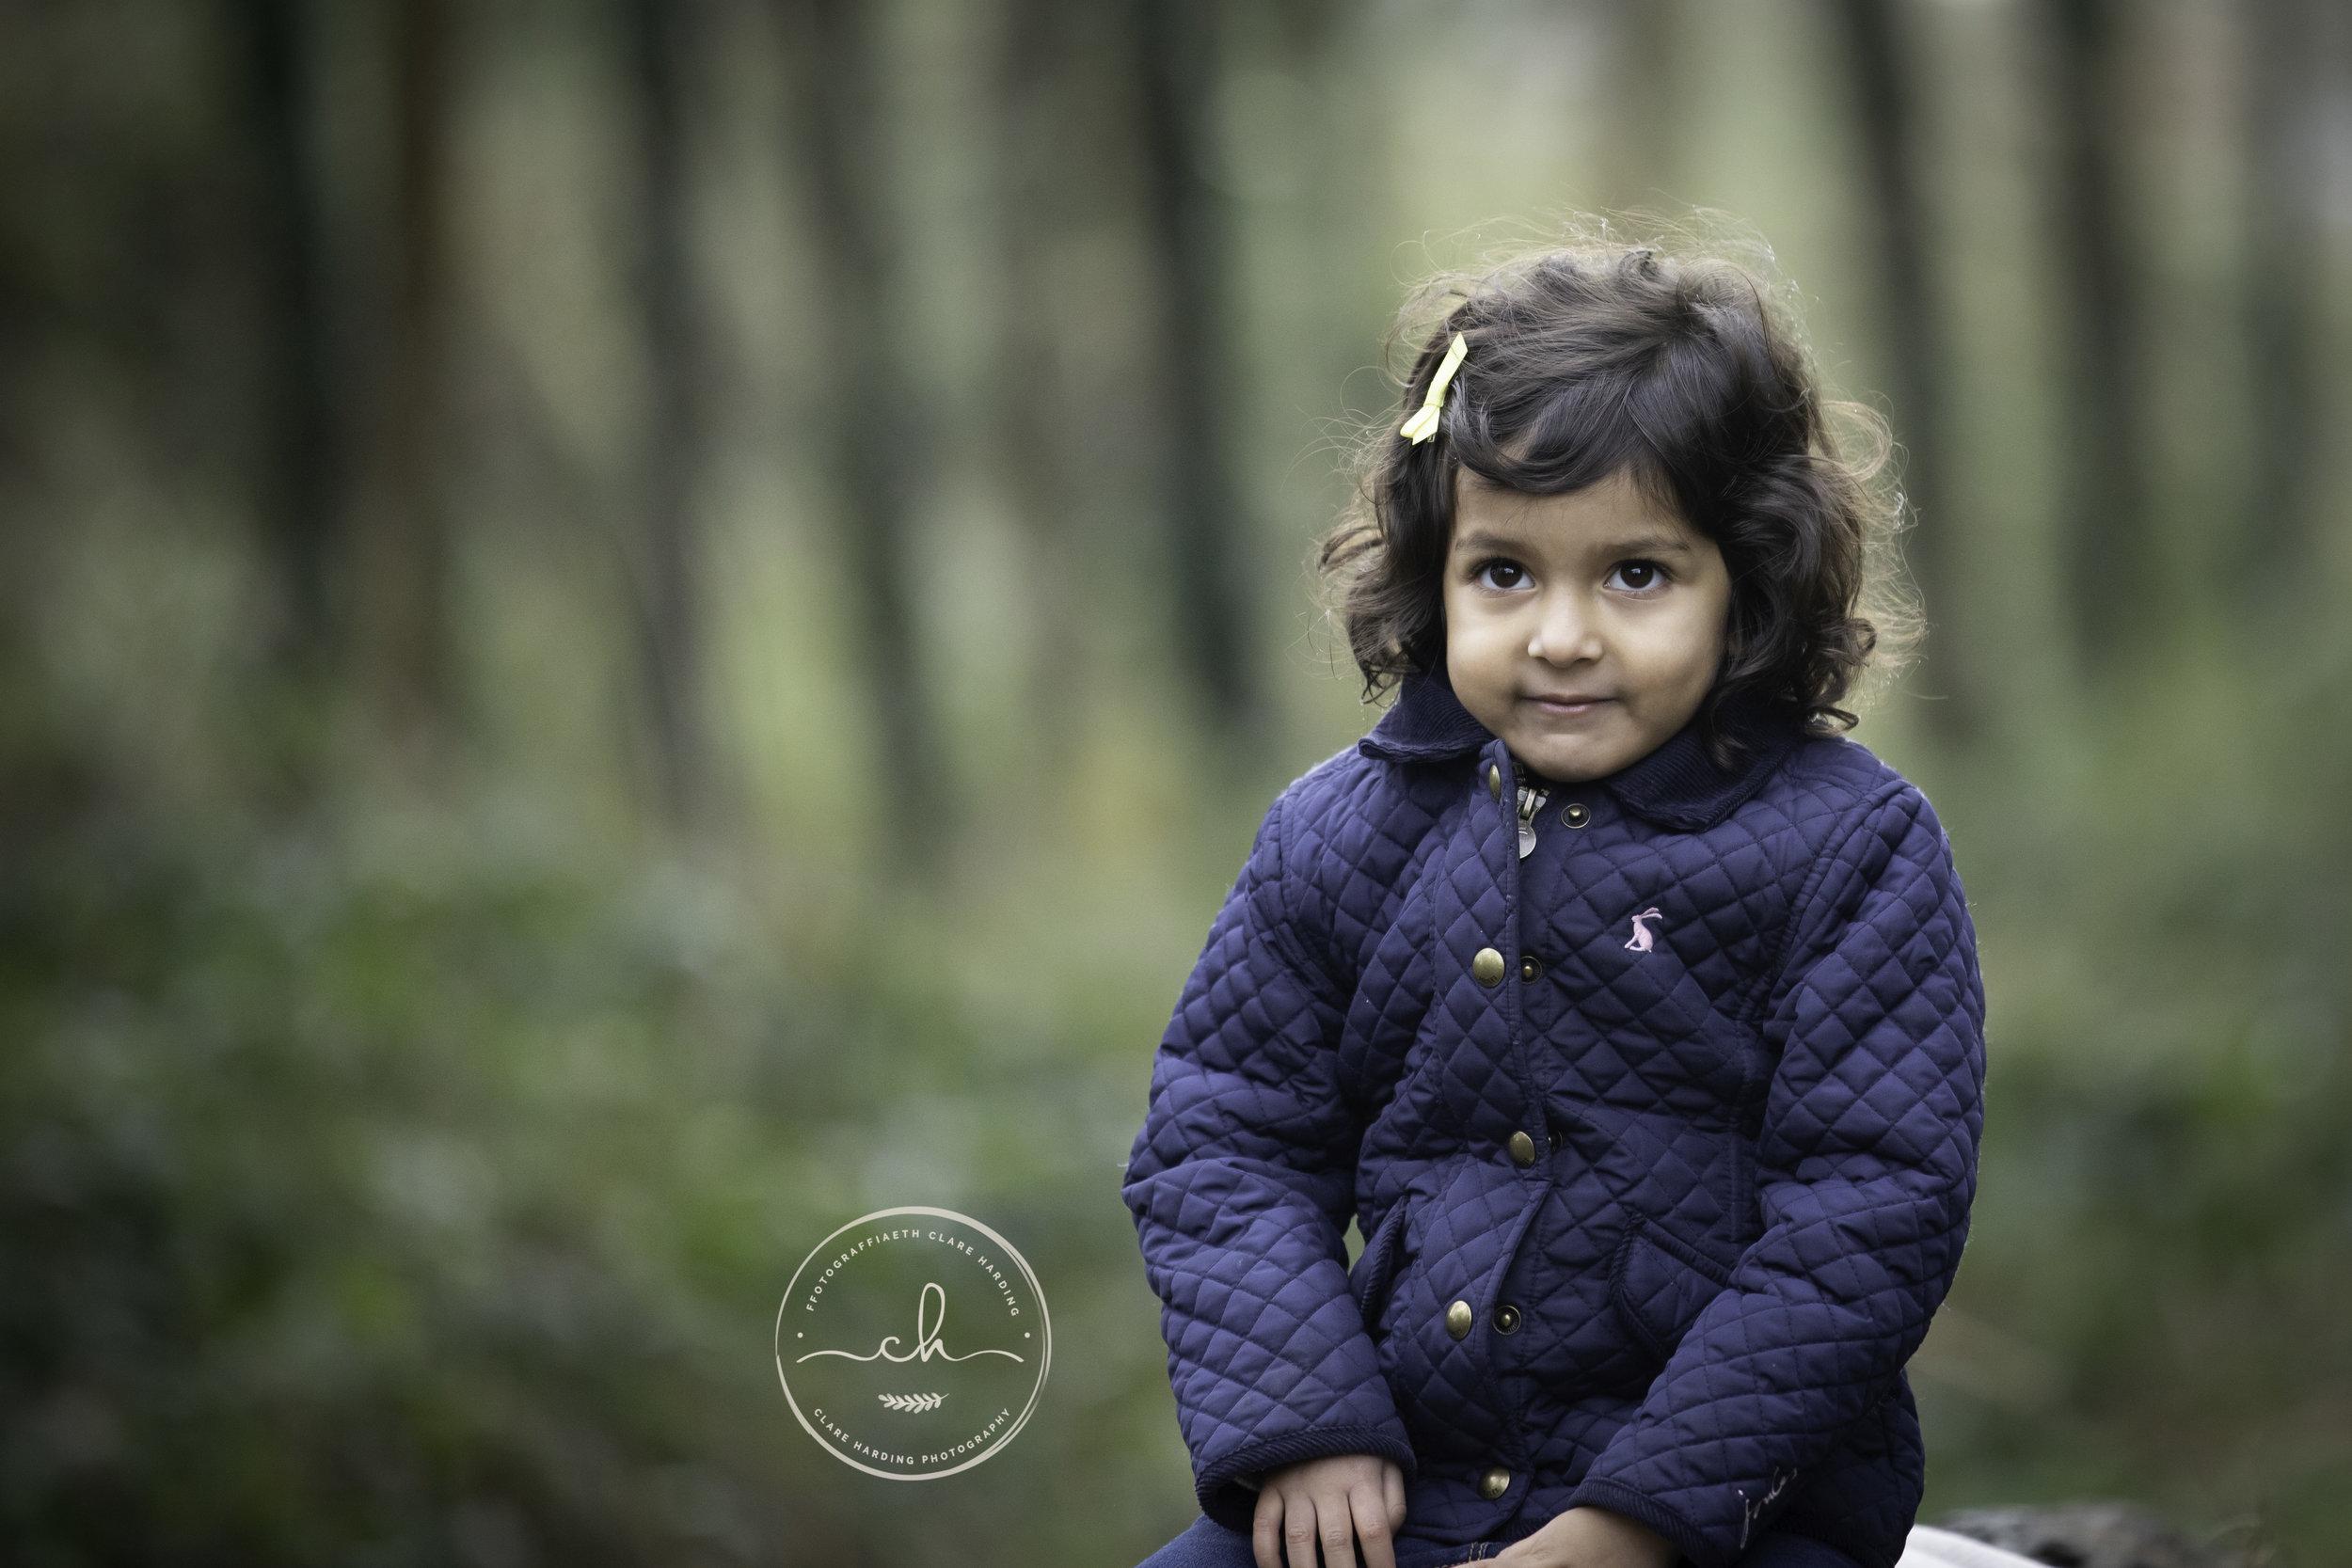 child family photographer cardiff vale of glamorgan outdoor.jpg